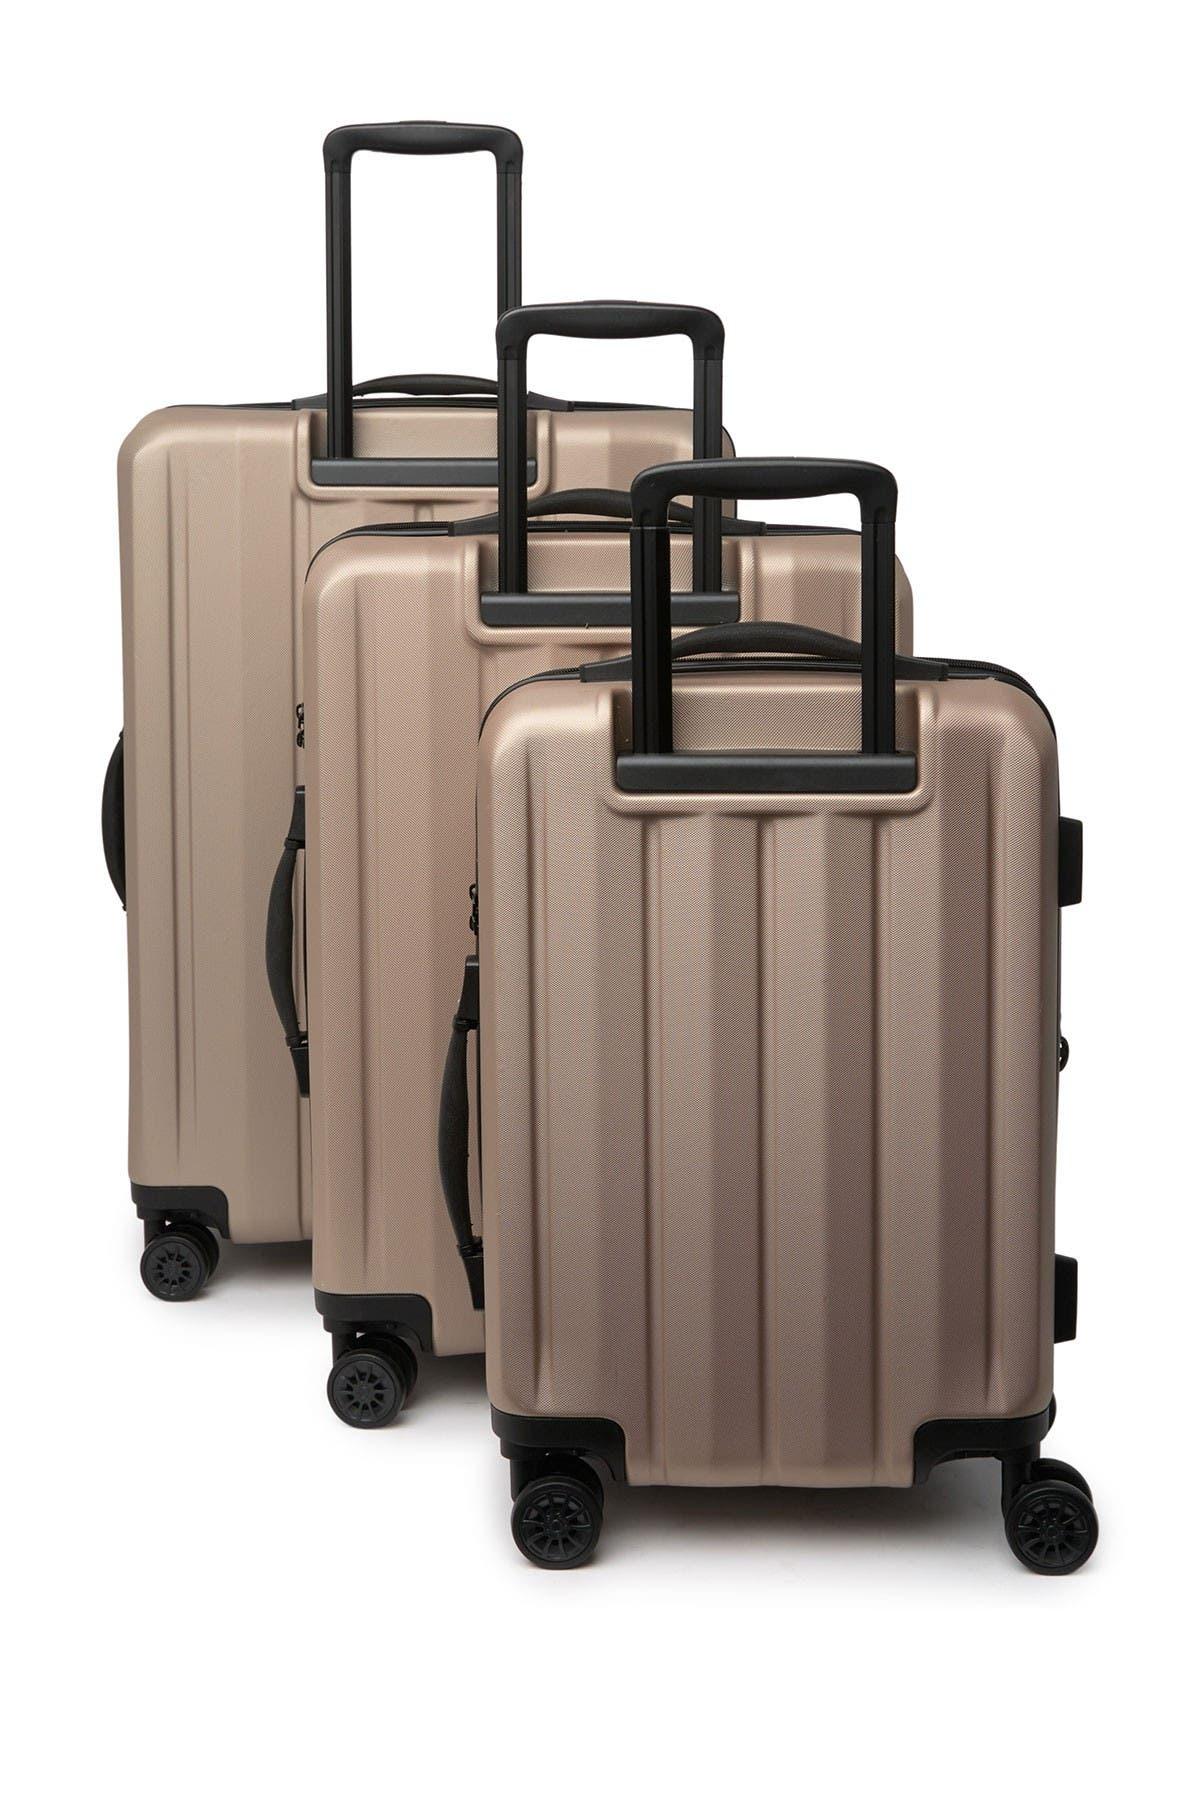 Image of CALPAK LUGGAGE Zyon Collection 3-Piece Luggage Set